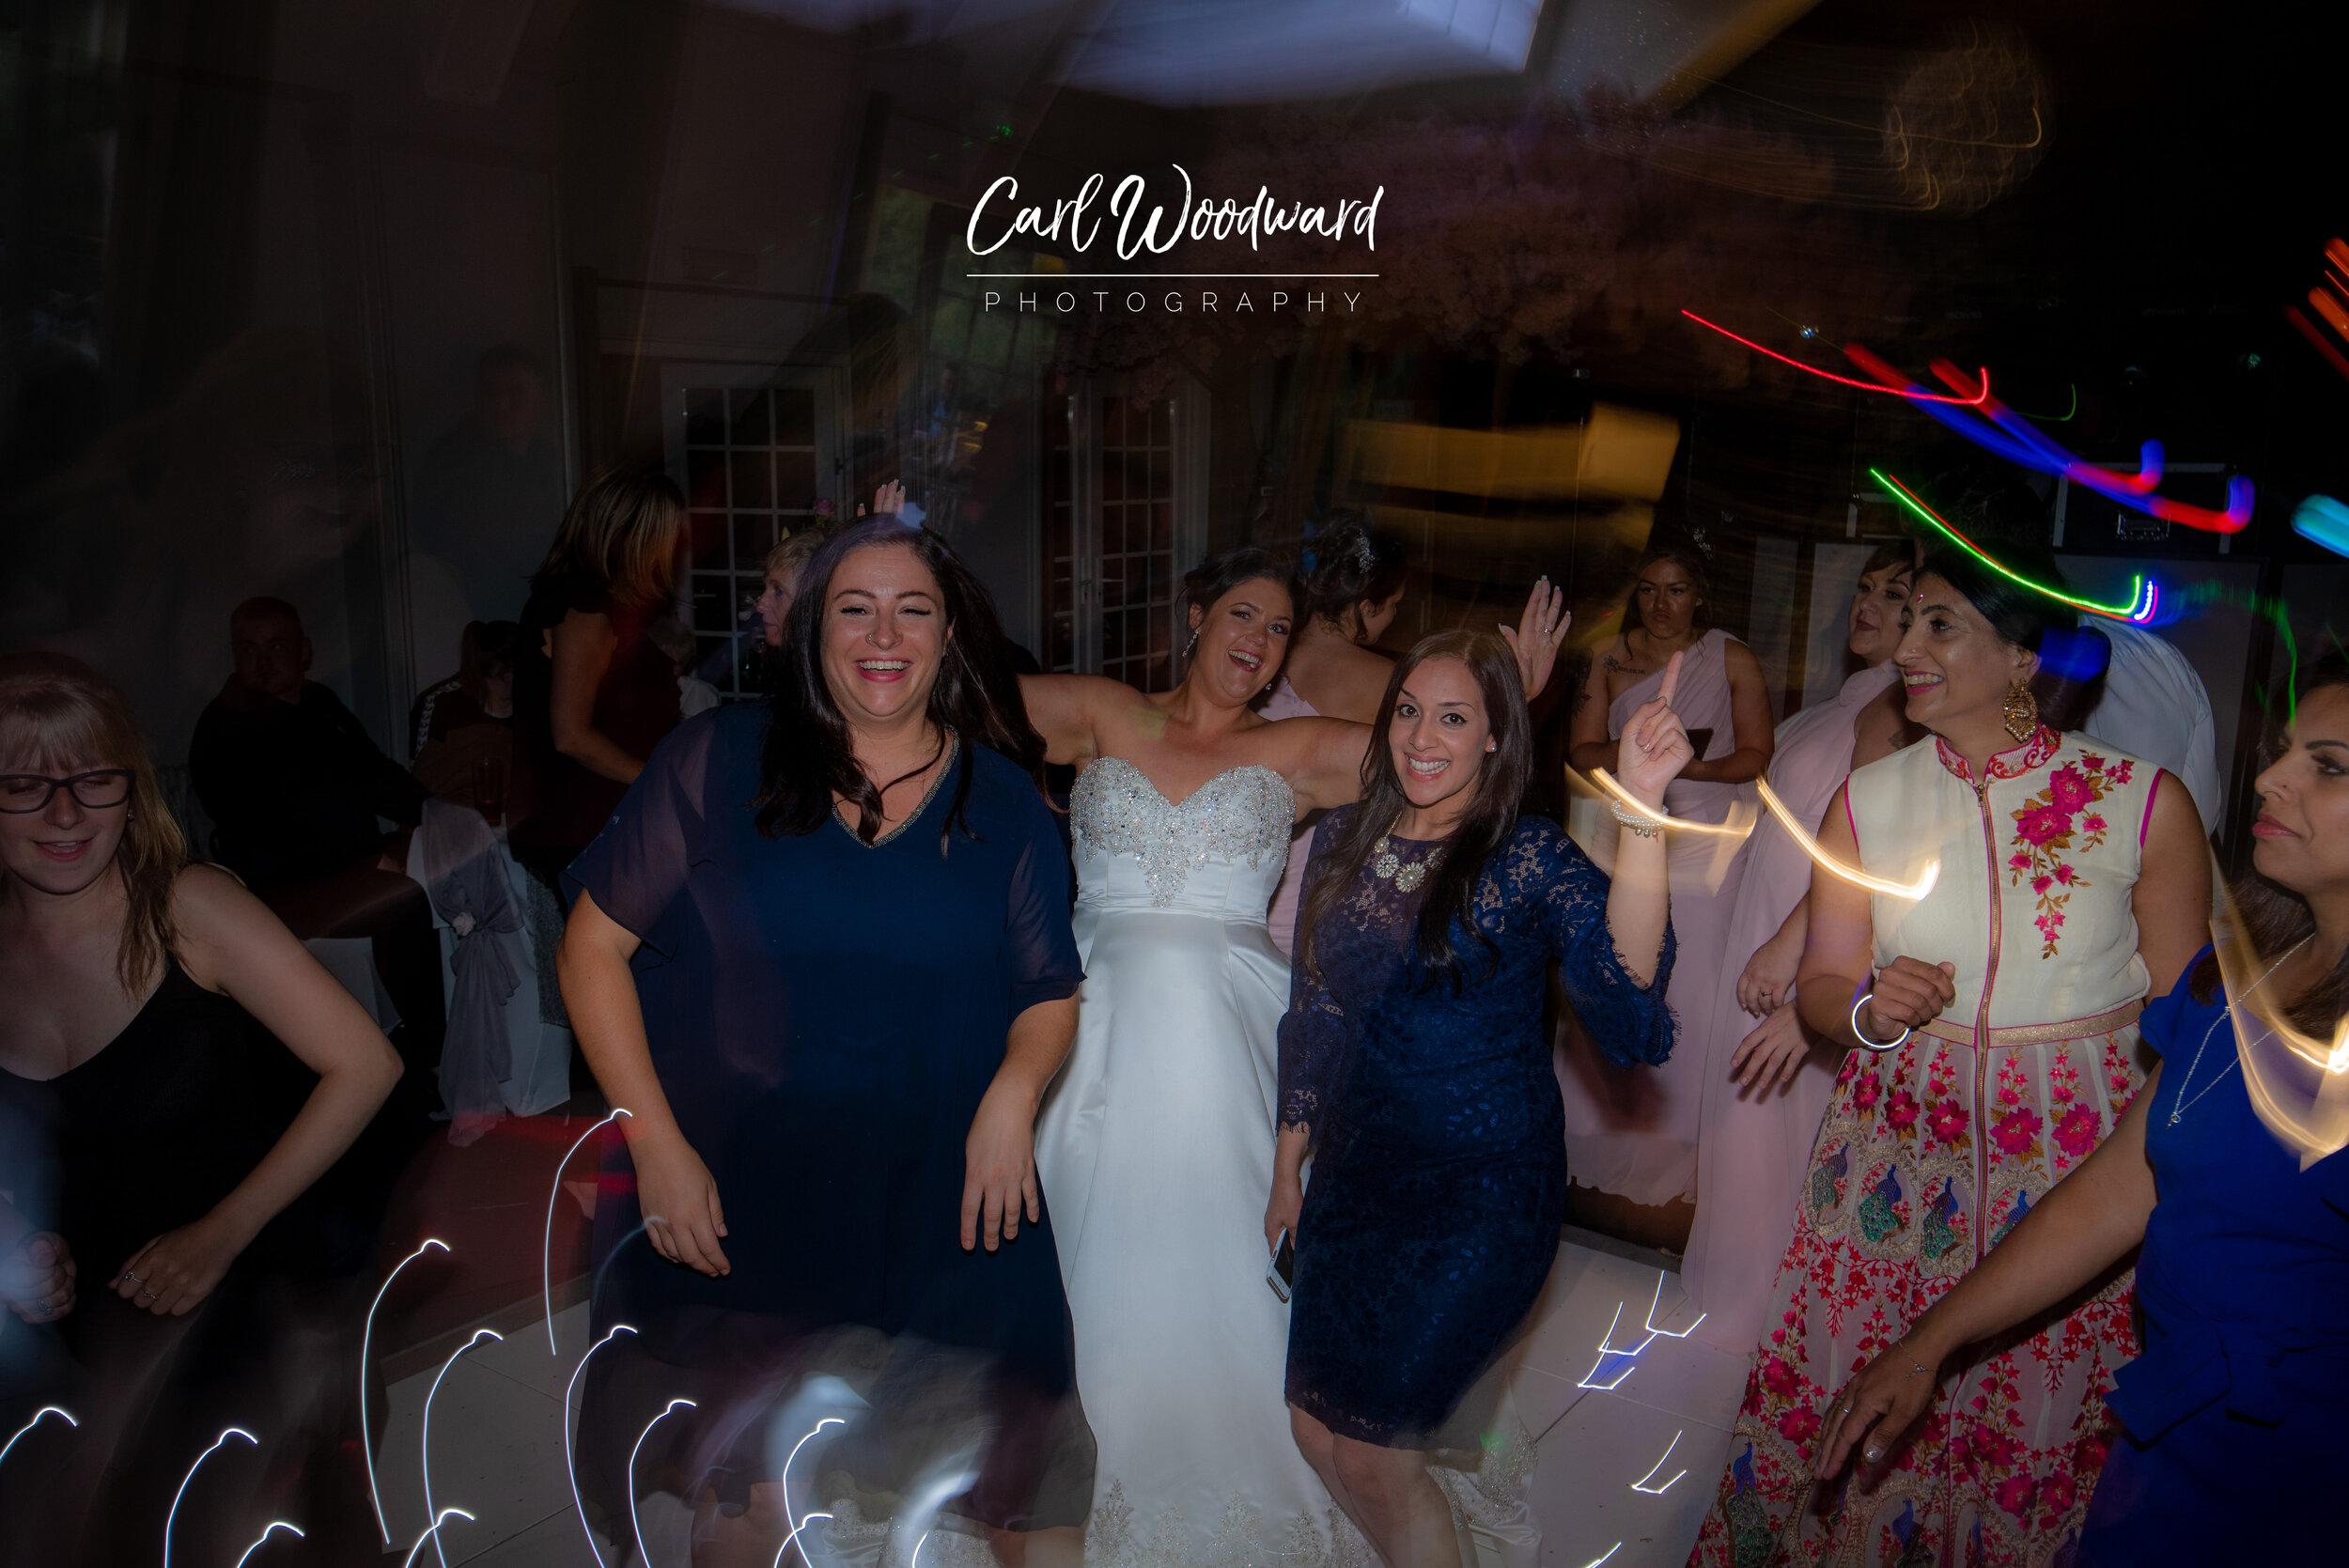 016-The-Holt-Fleet-Wedding-Photos.jpg